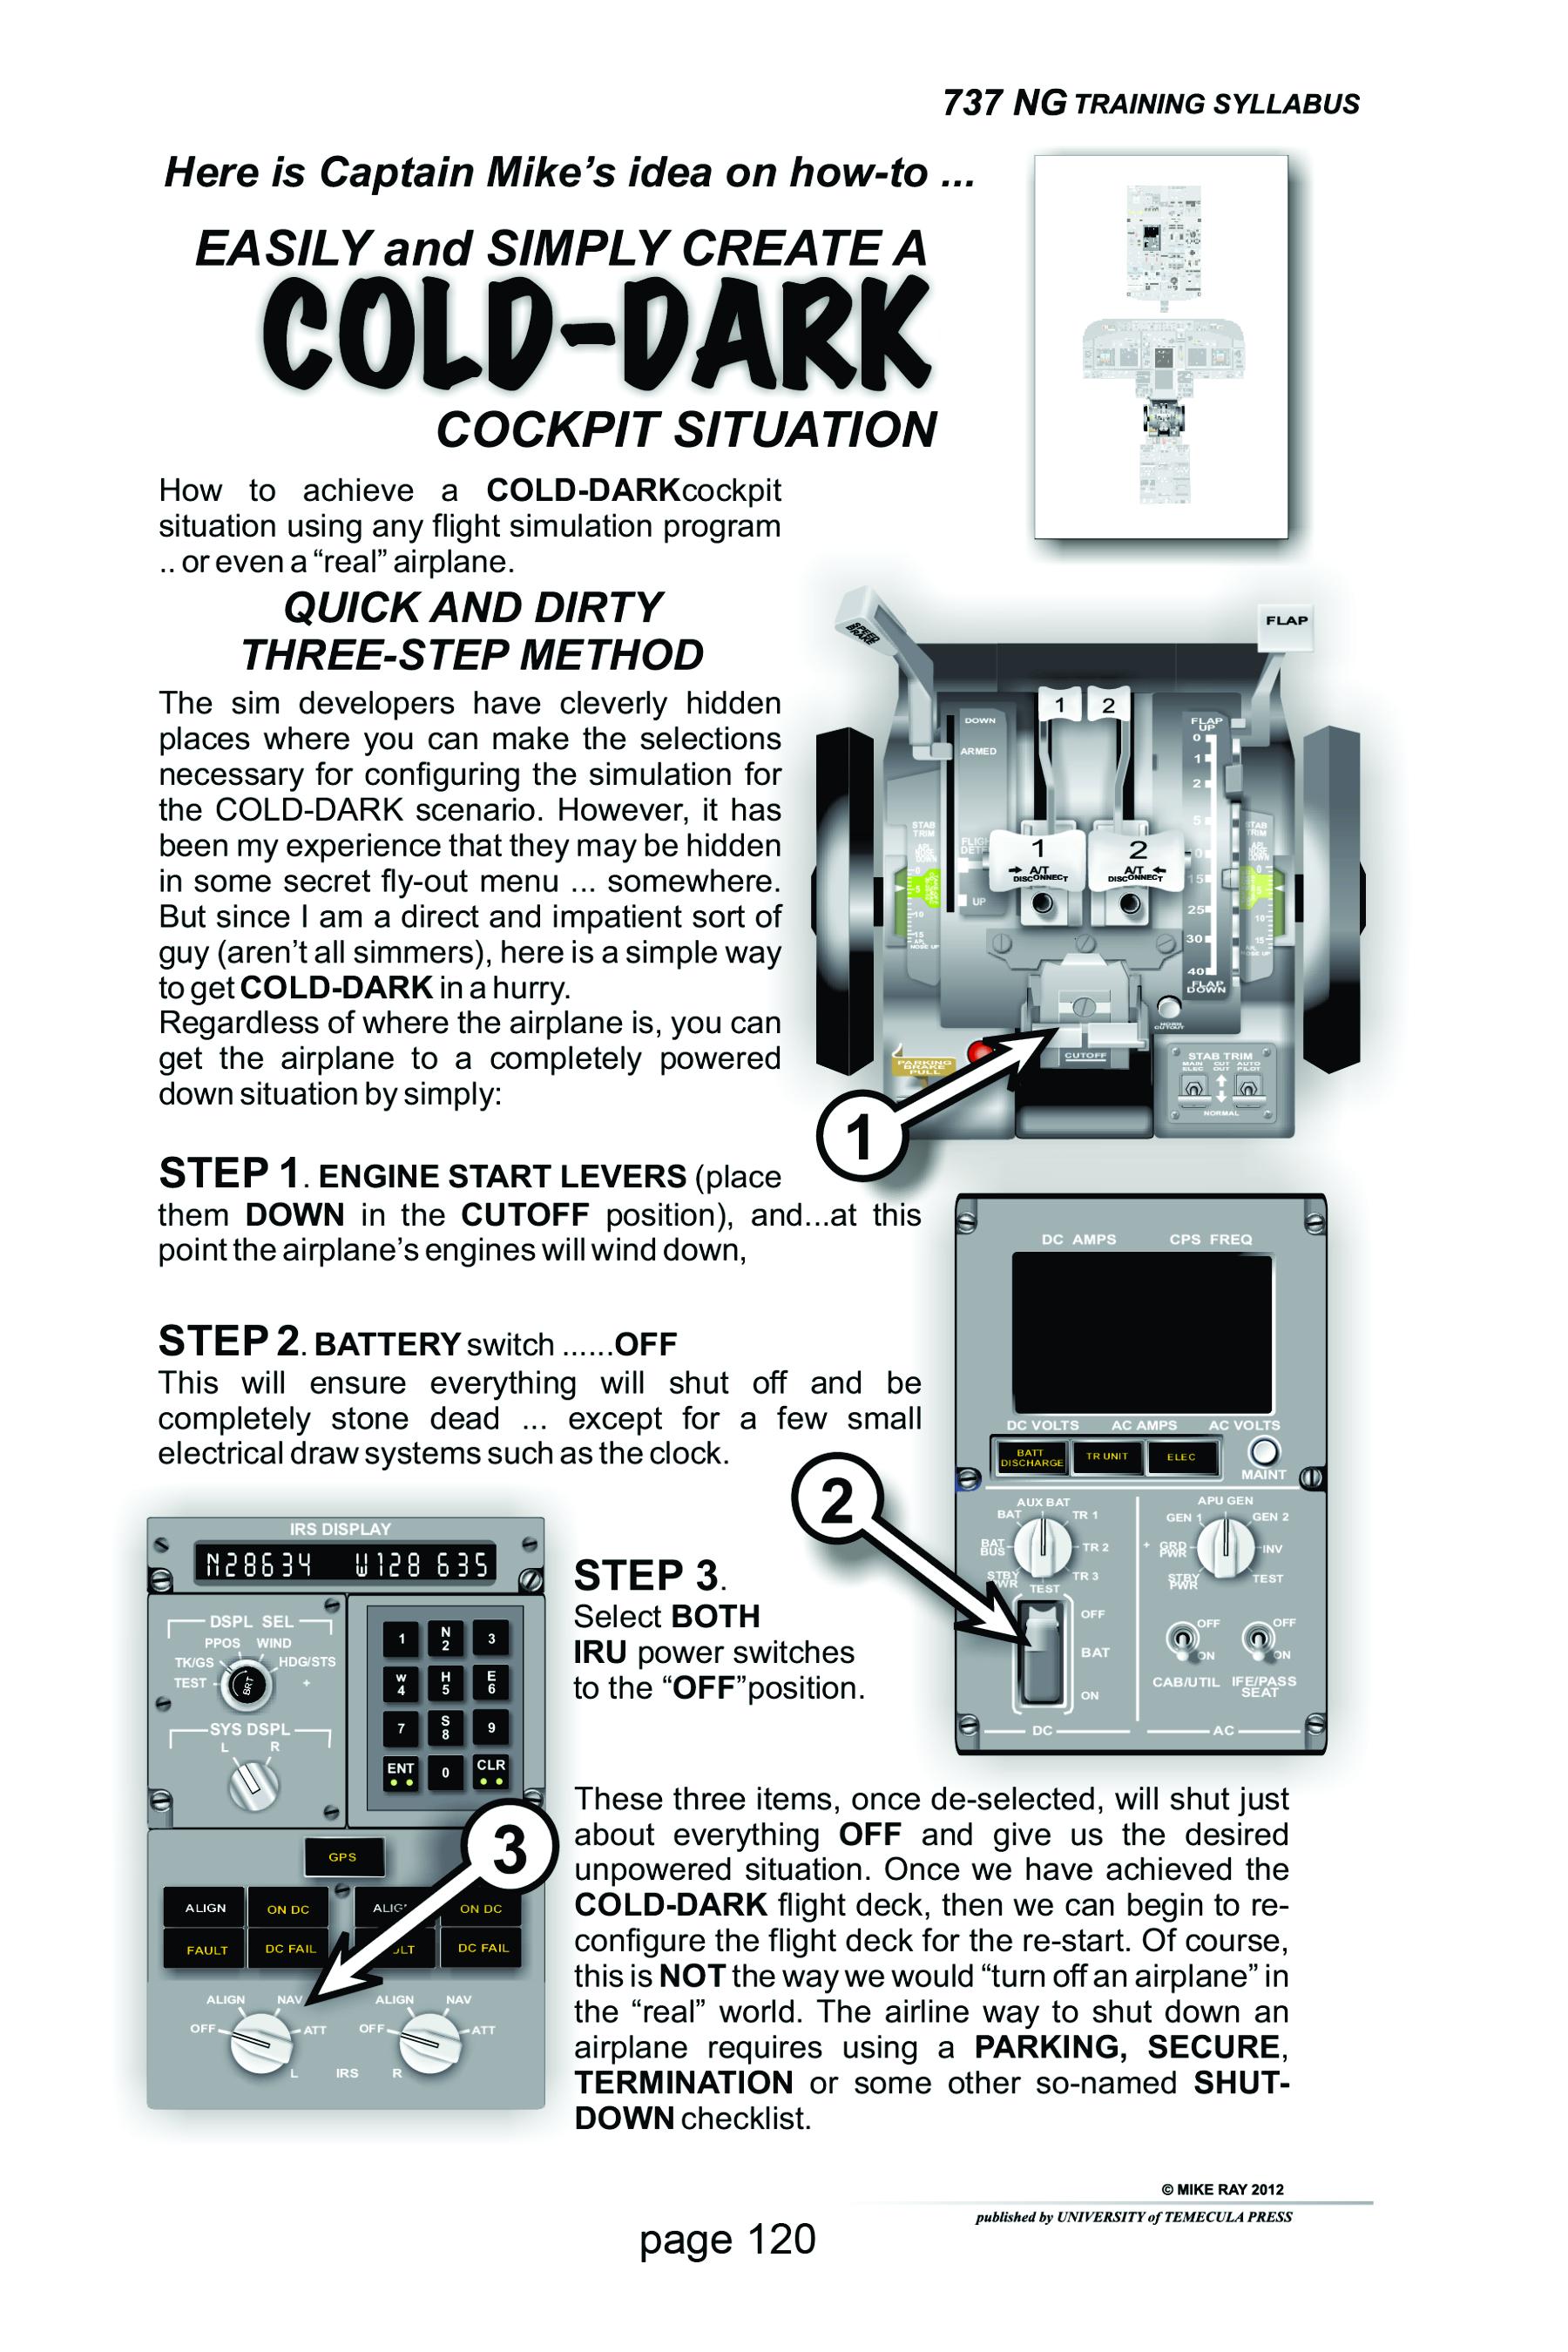 737 Cockpit Companion Pdf